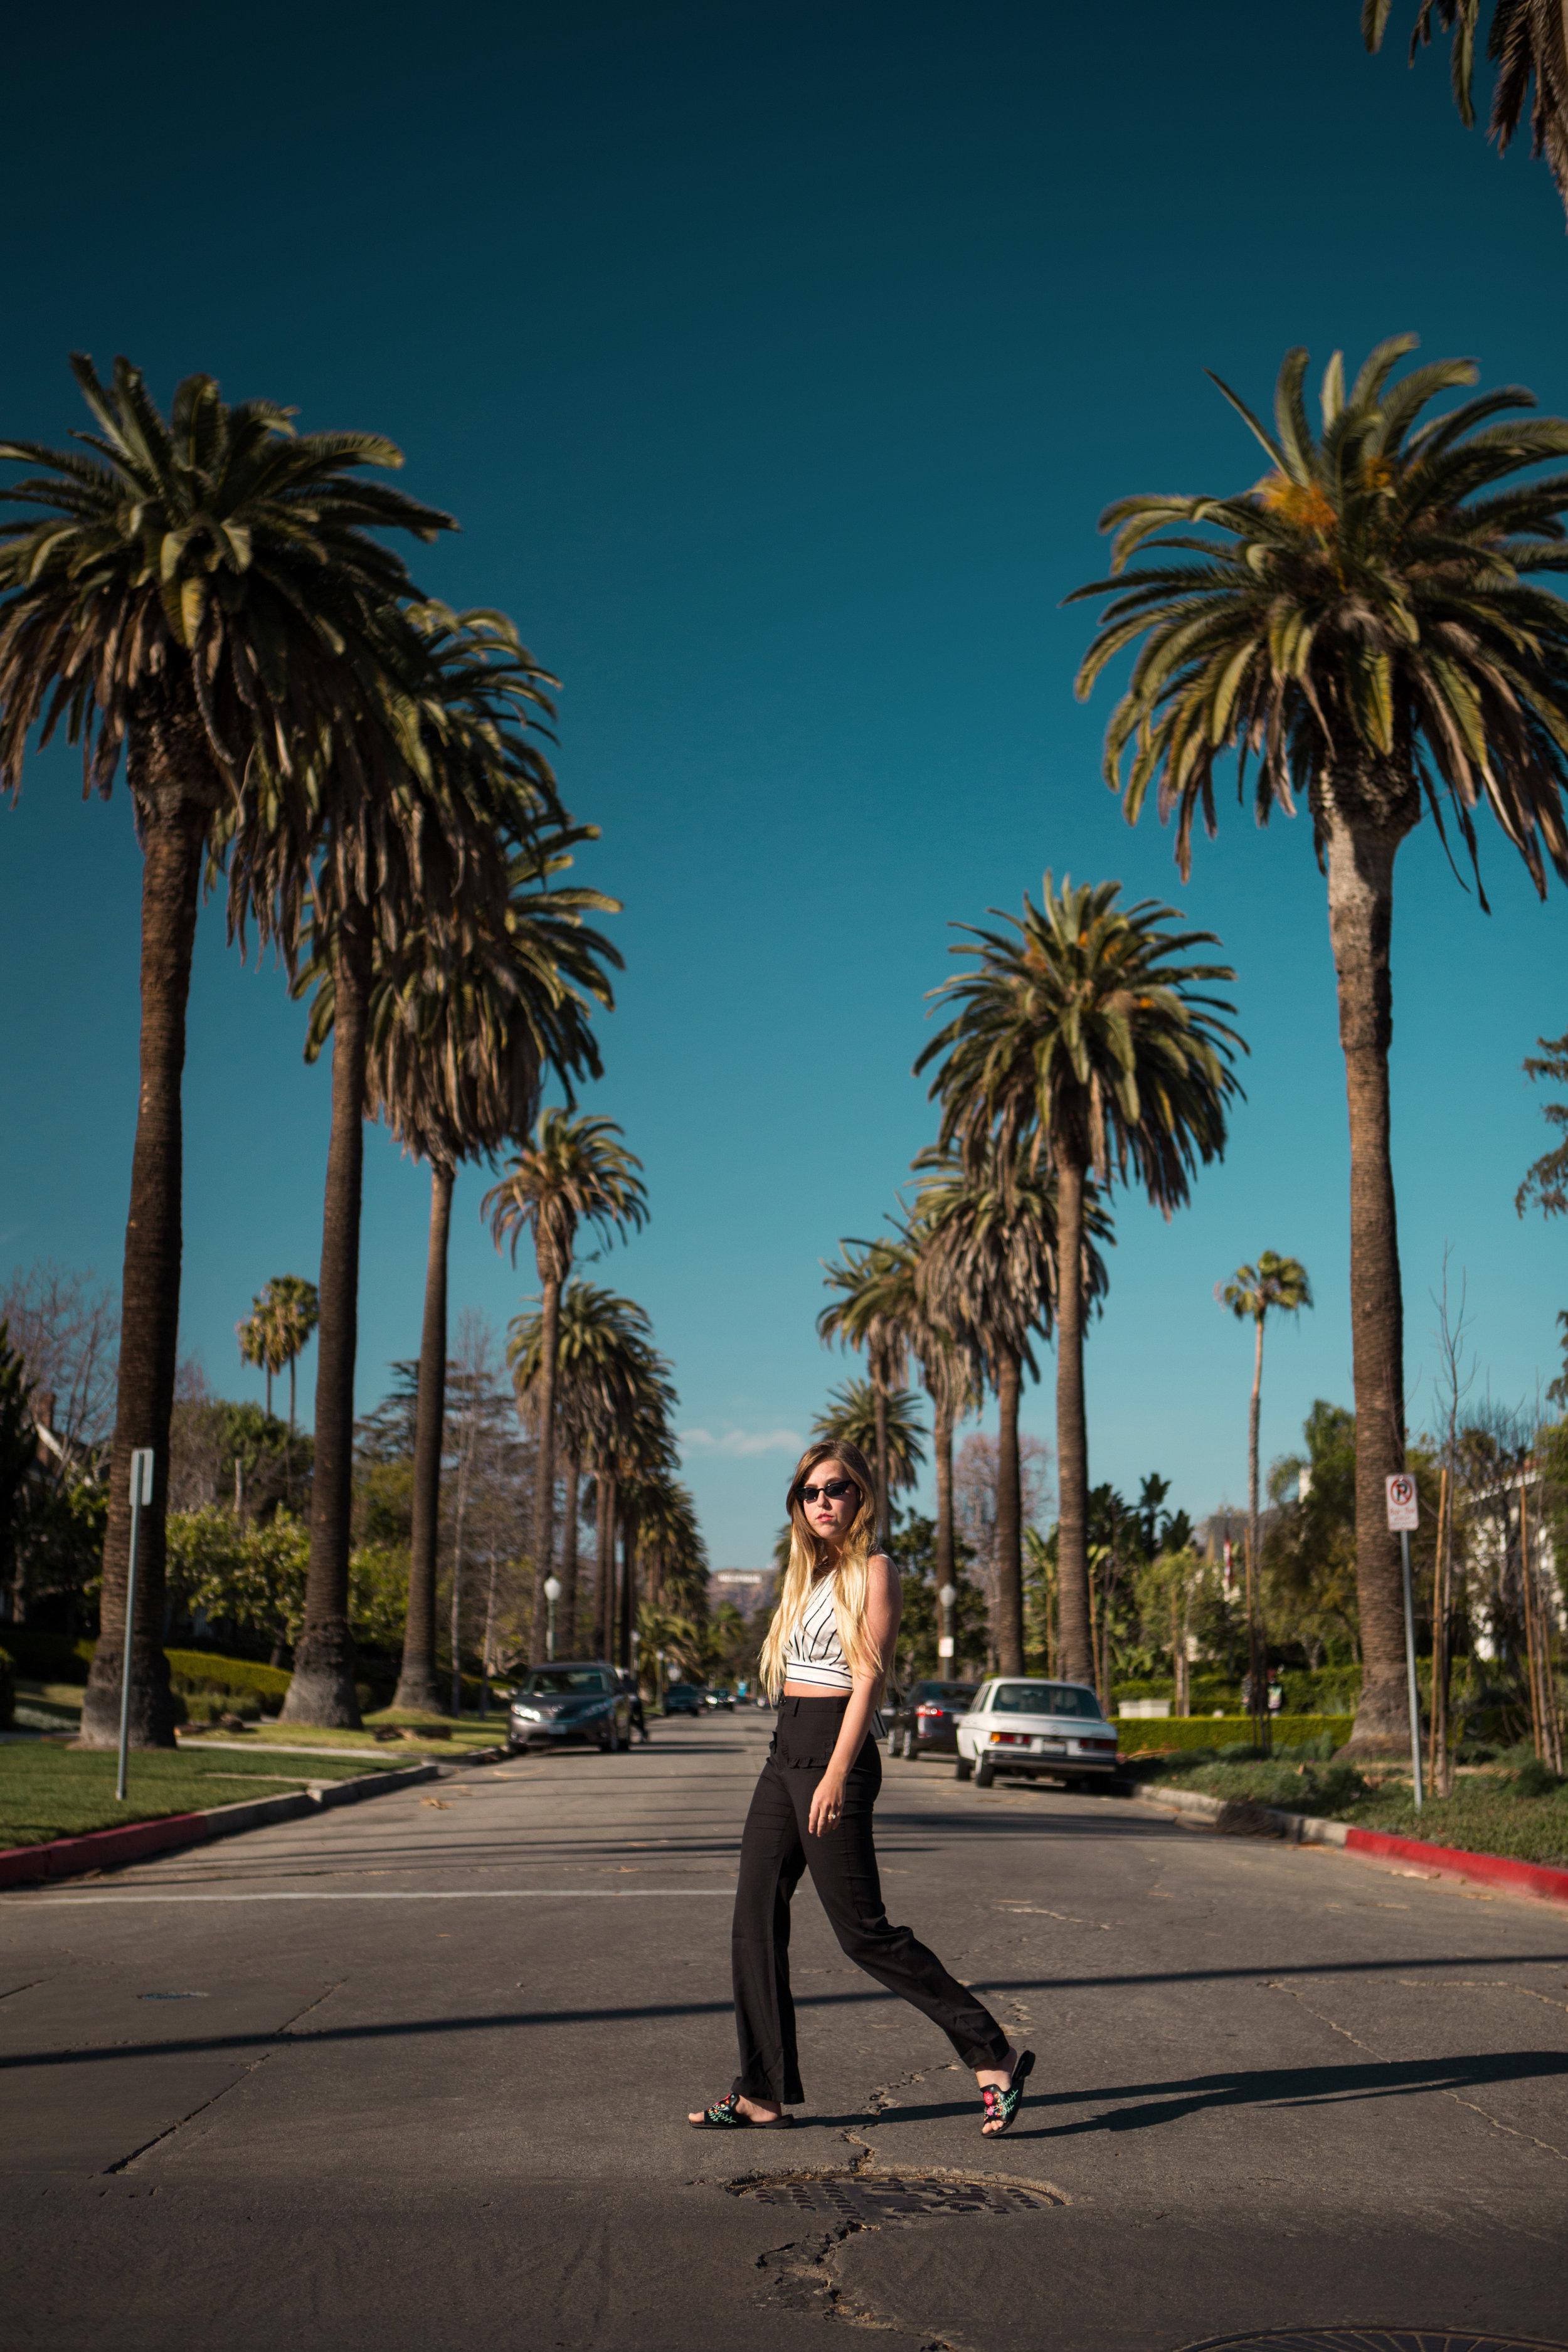 AstroBandit_Iconic_Palm_Tree_Lined_Street_Los_Angeles_Holywood_Sign_3.jpg